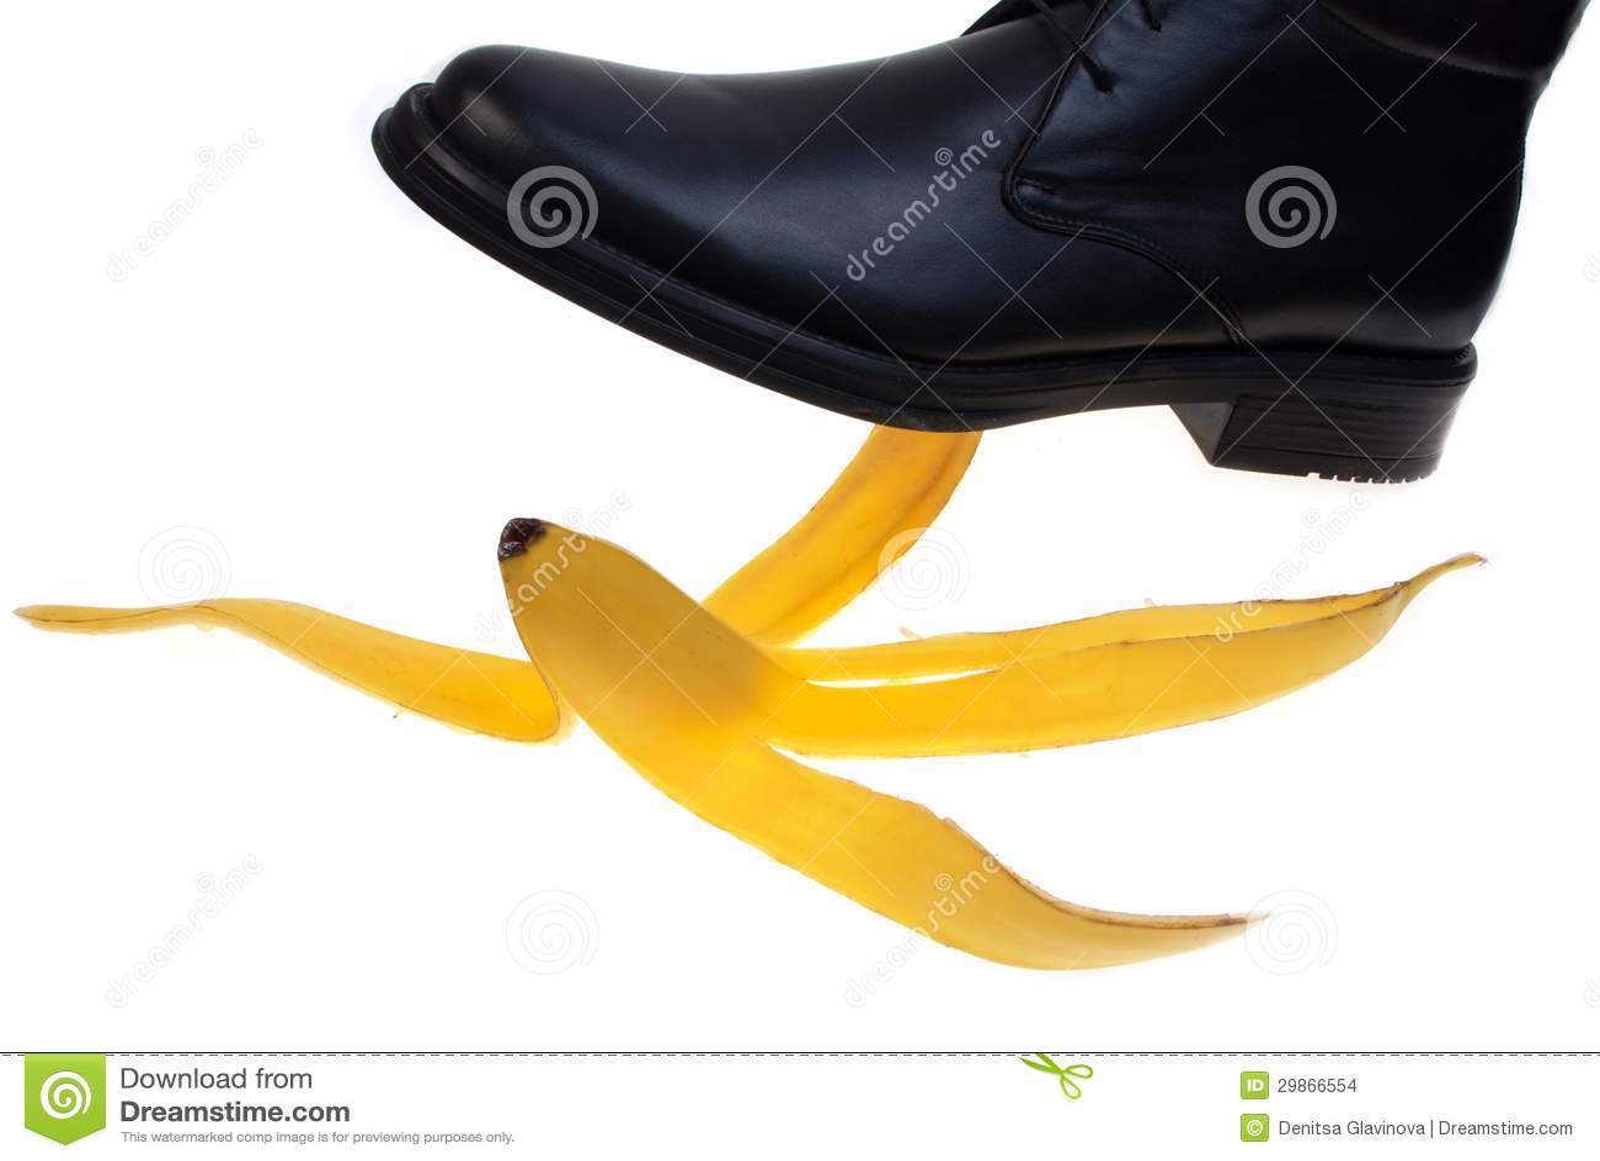 banana peel as shoe polish background of the study